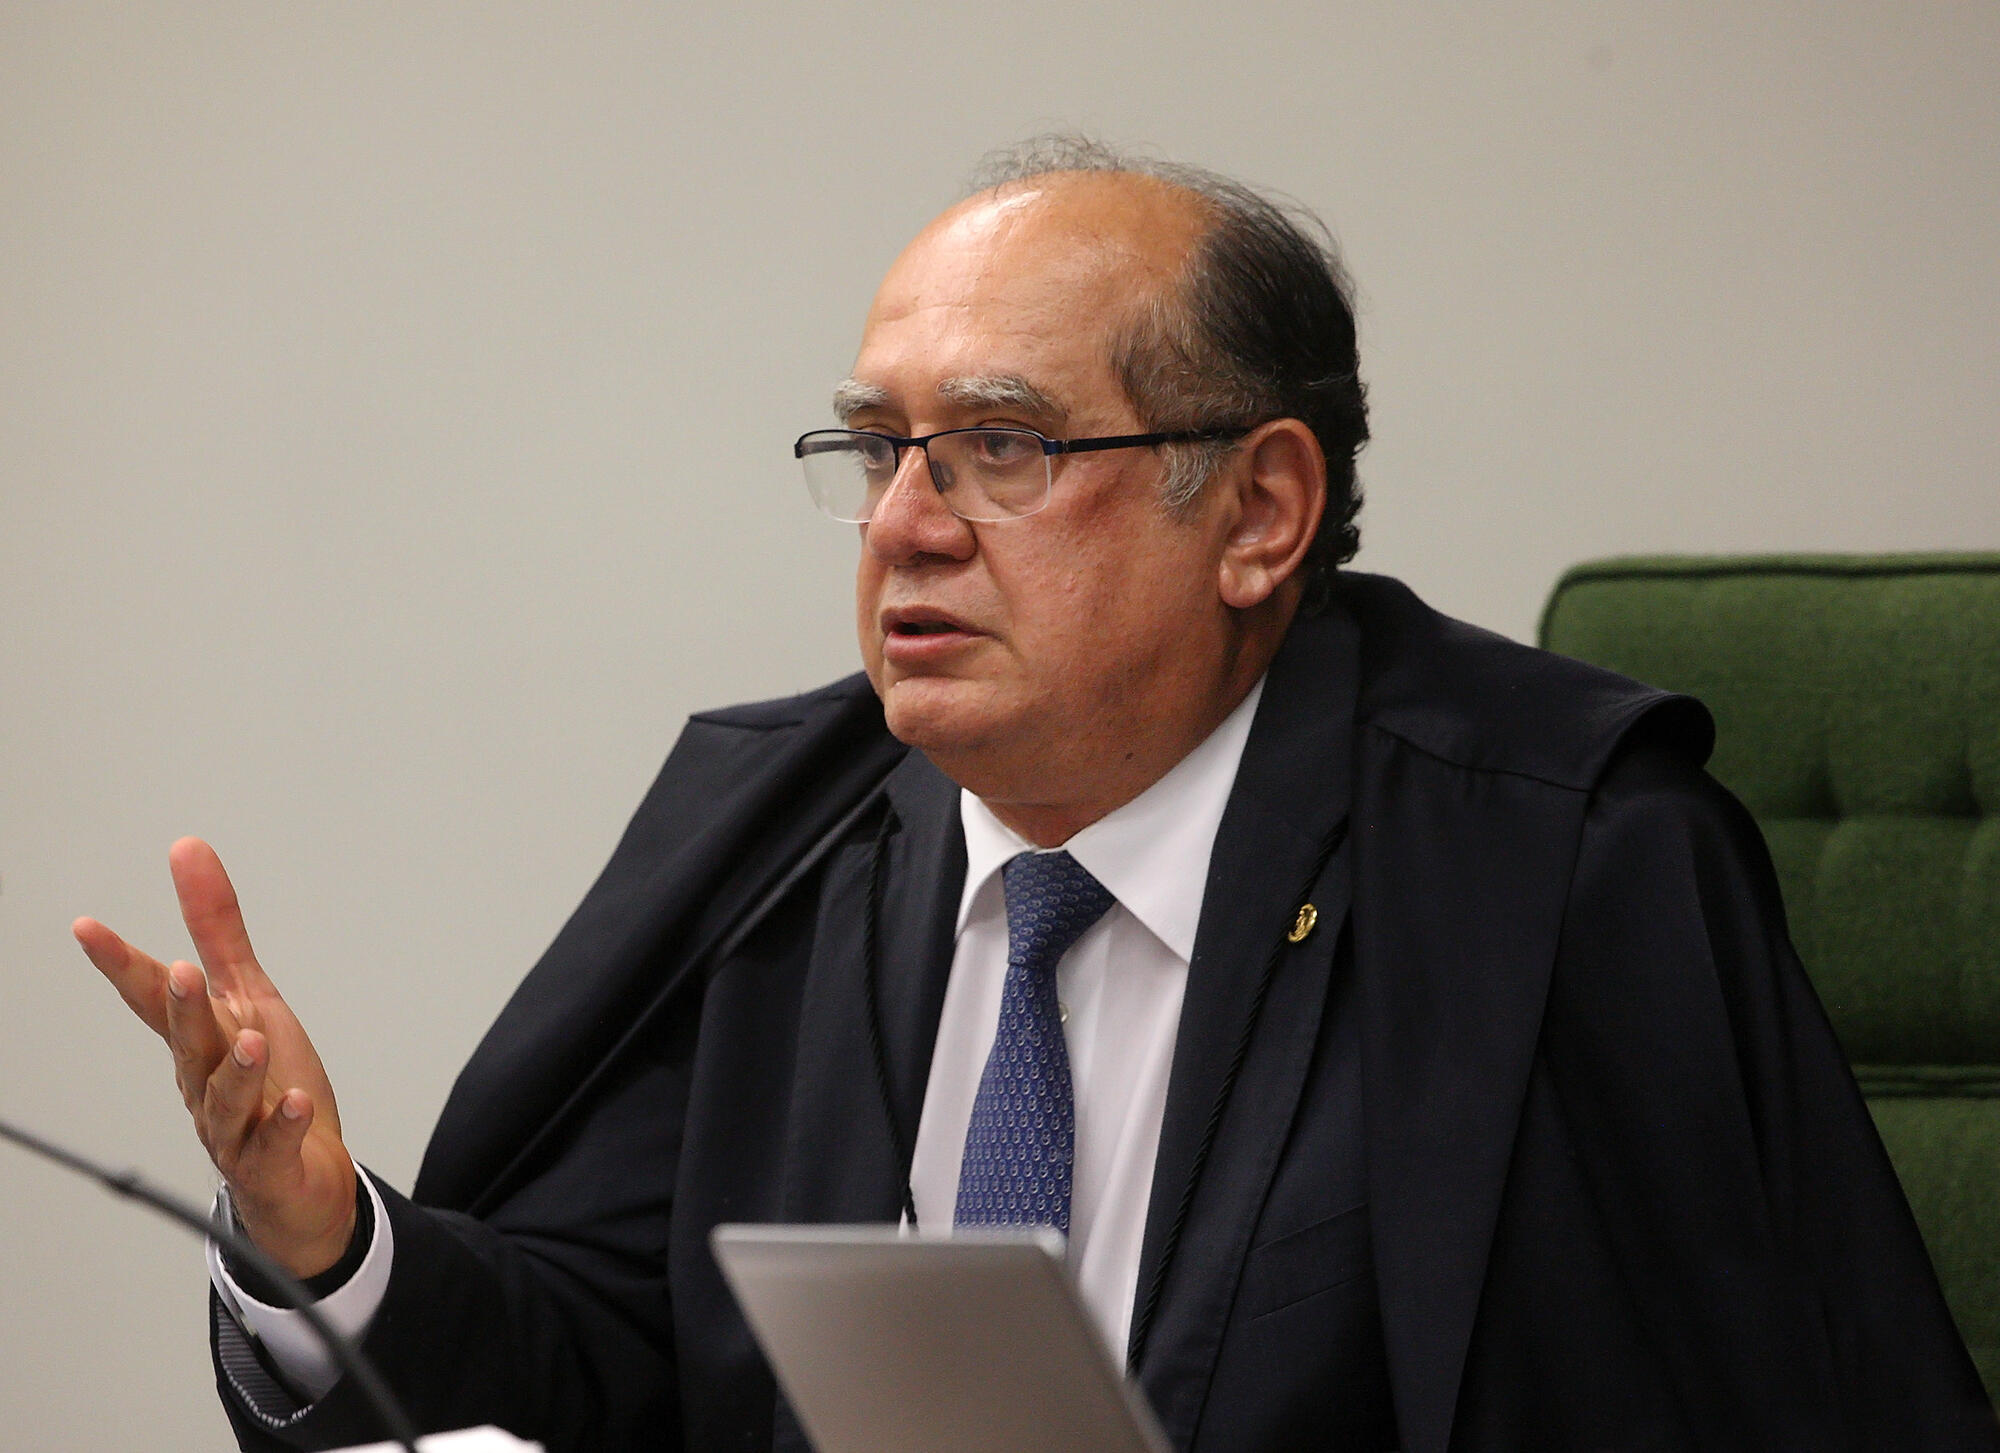 O ministro do Supremo Tribunal Federal, Gilmar Mendes